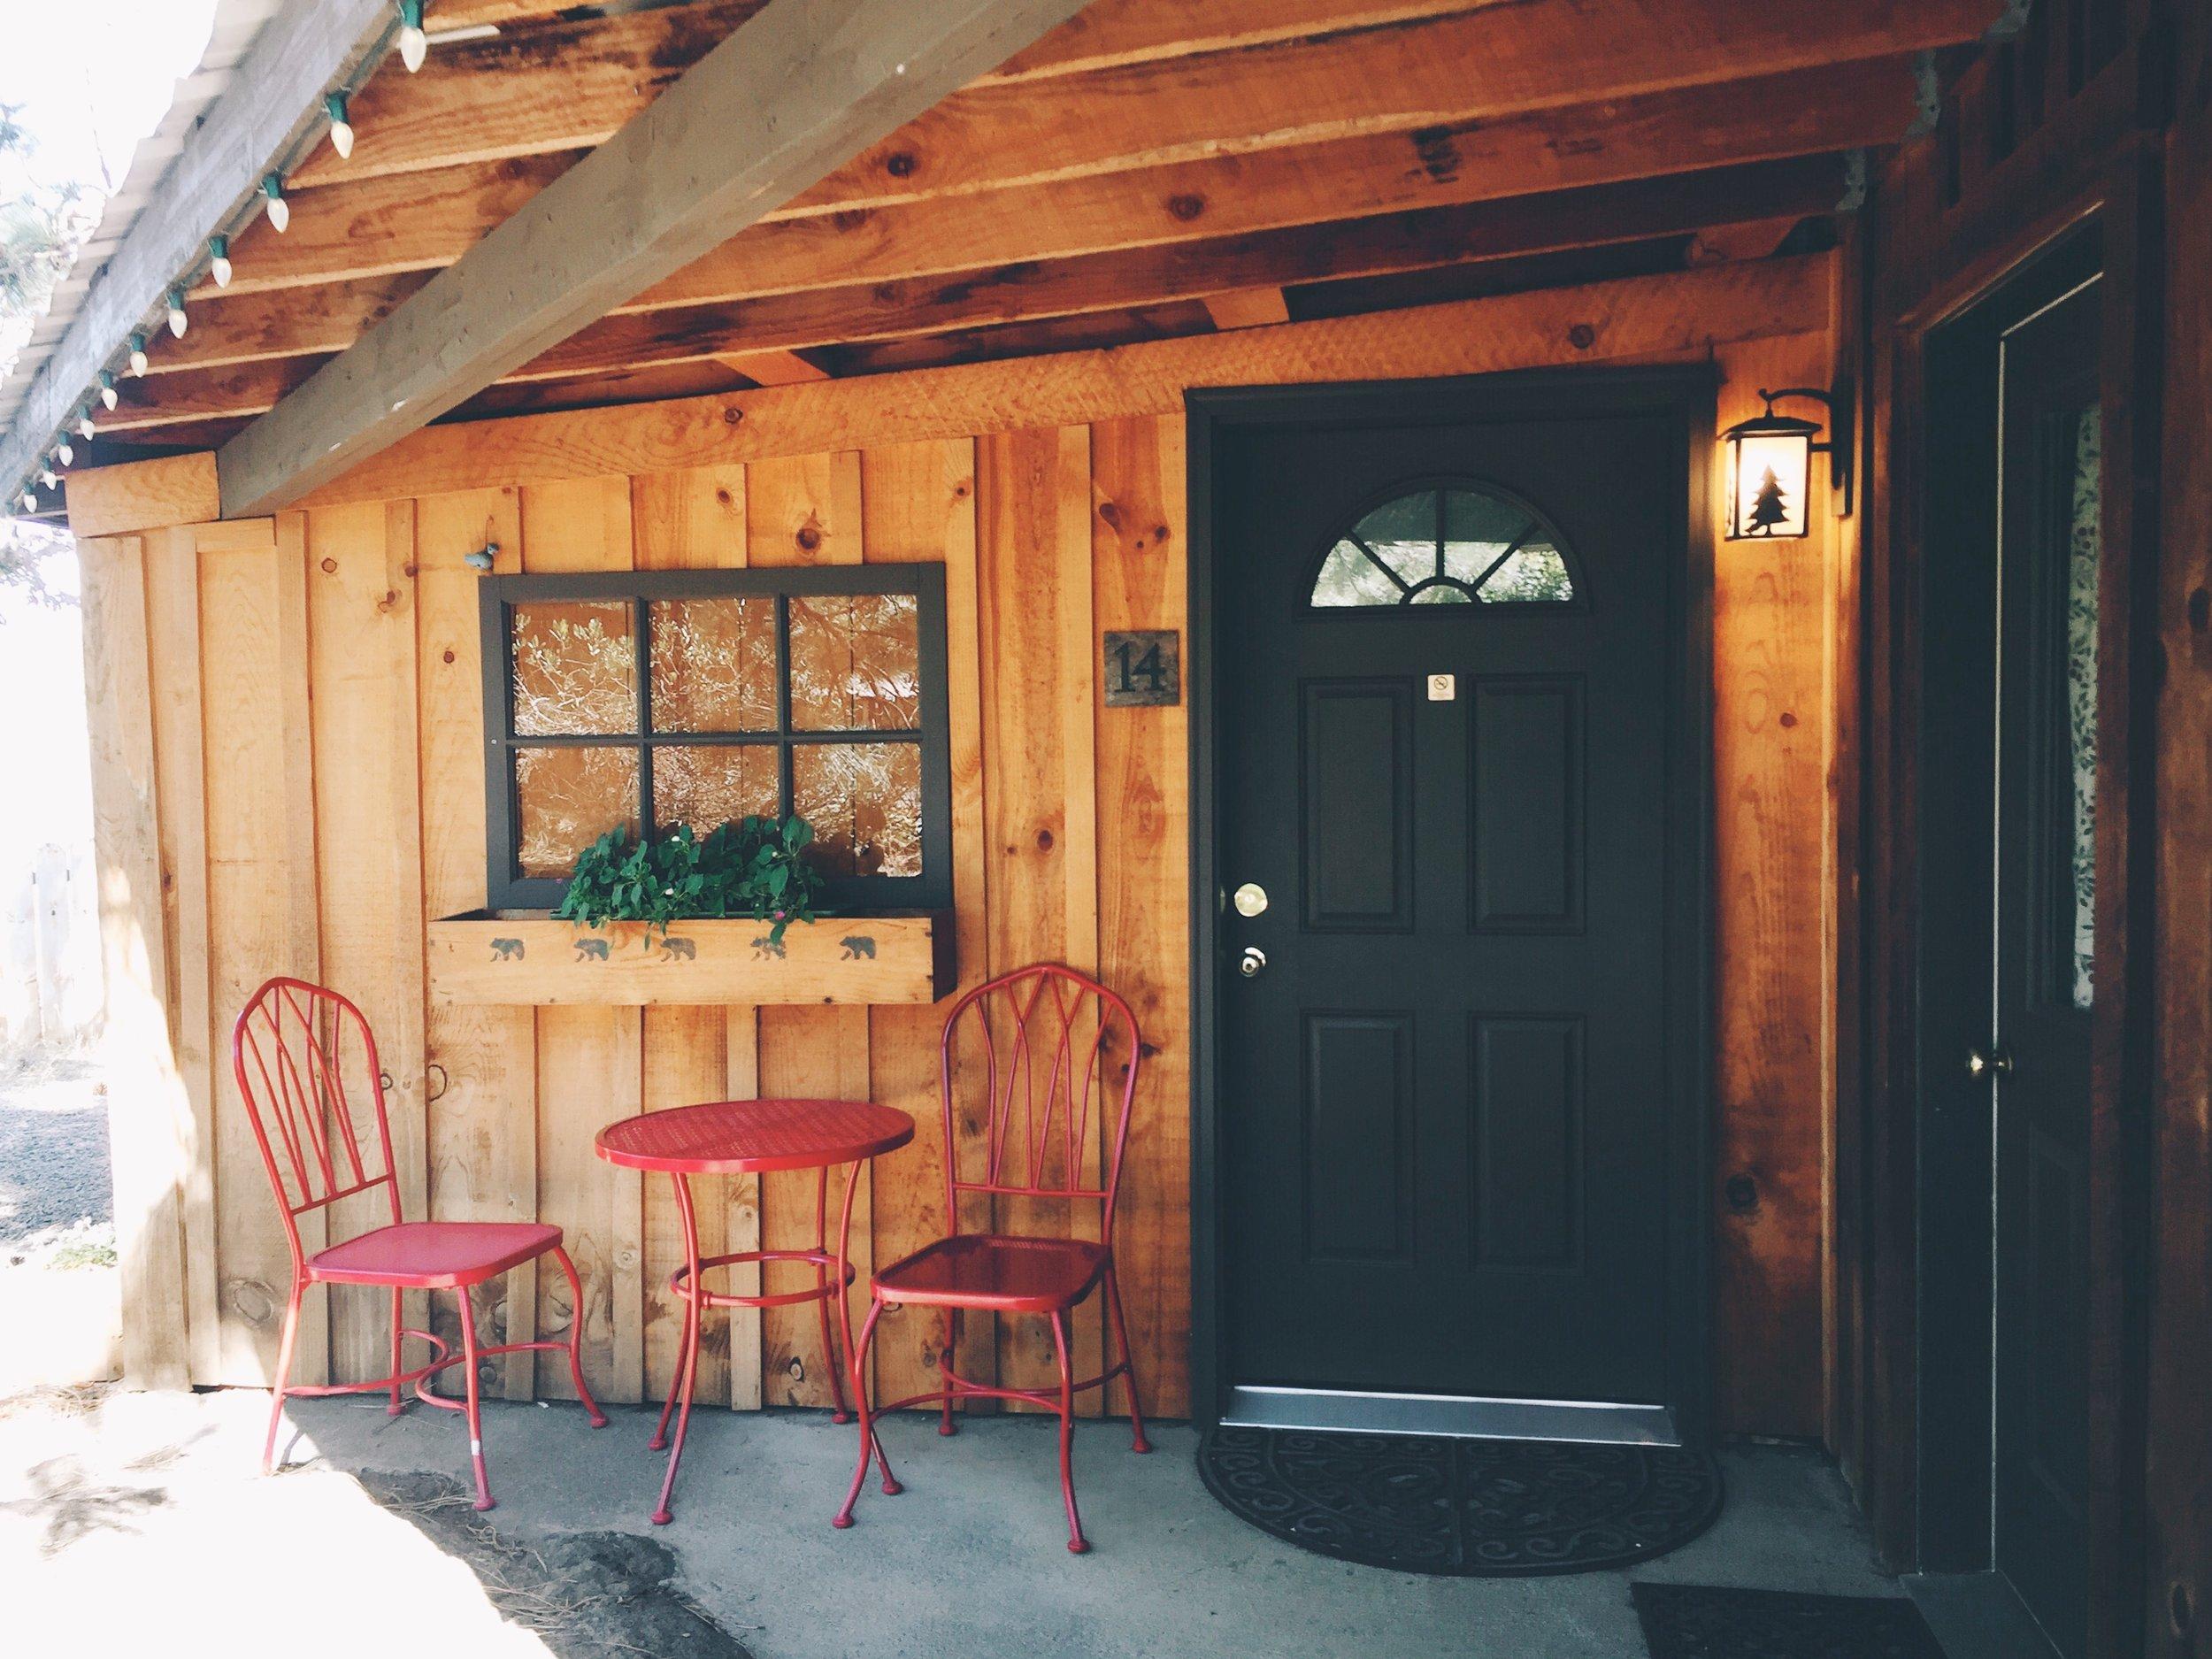 Cute room at the inn